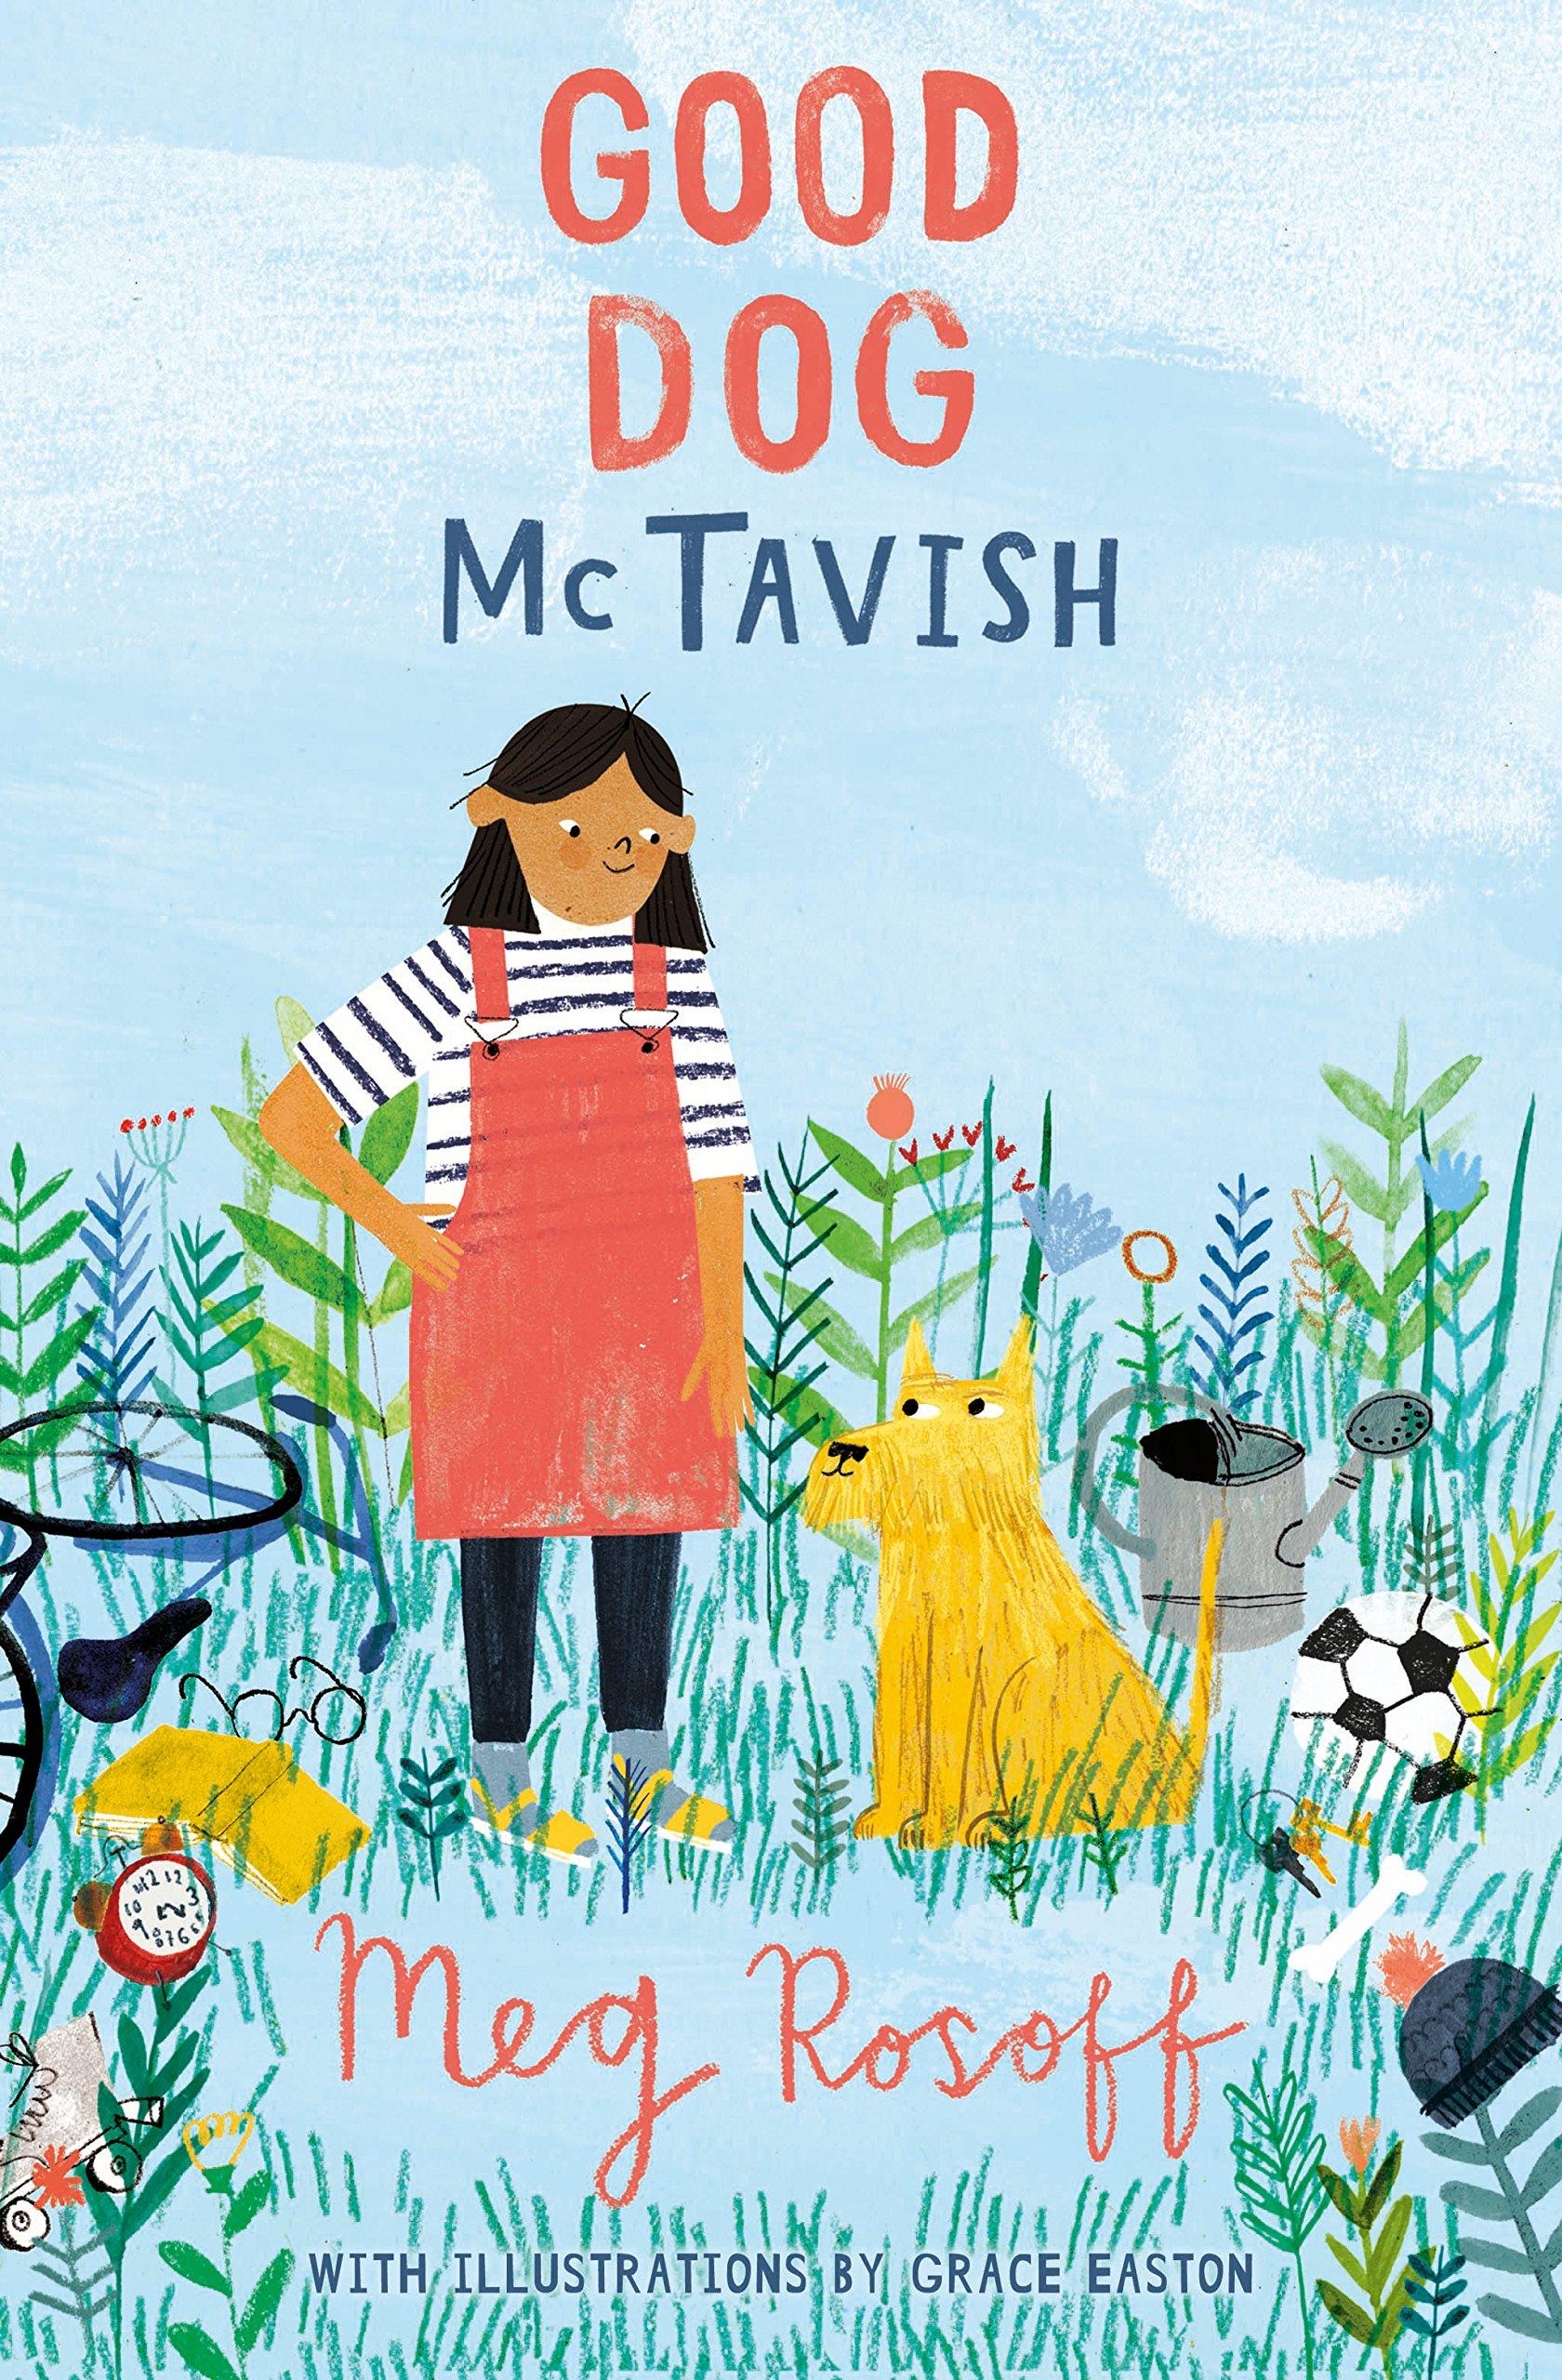 Read Online Good Dog Mctavish ebook